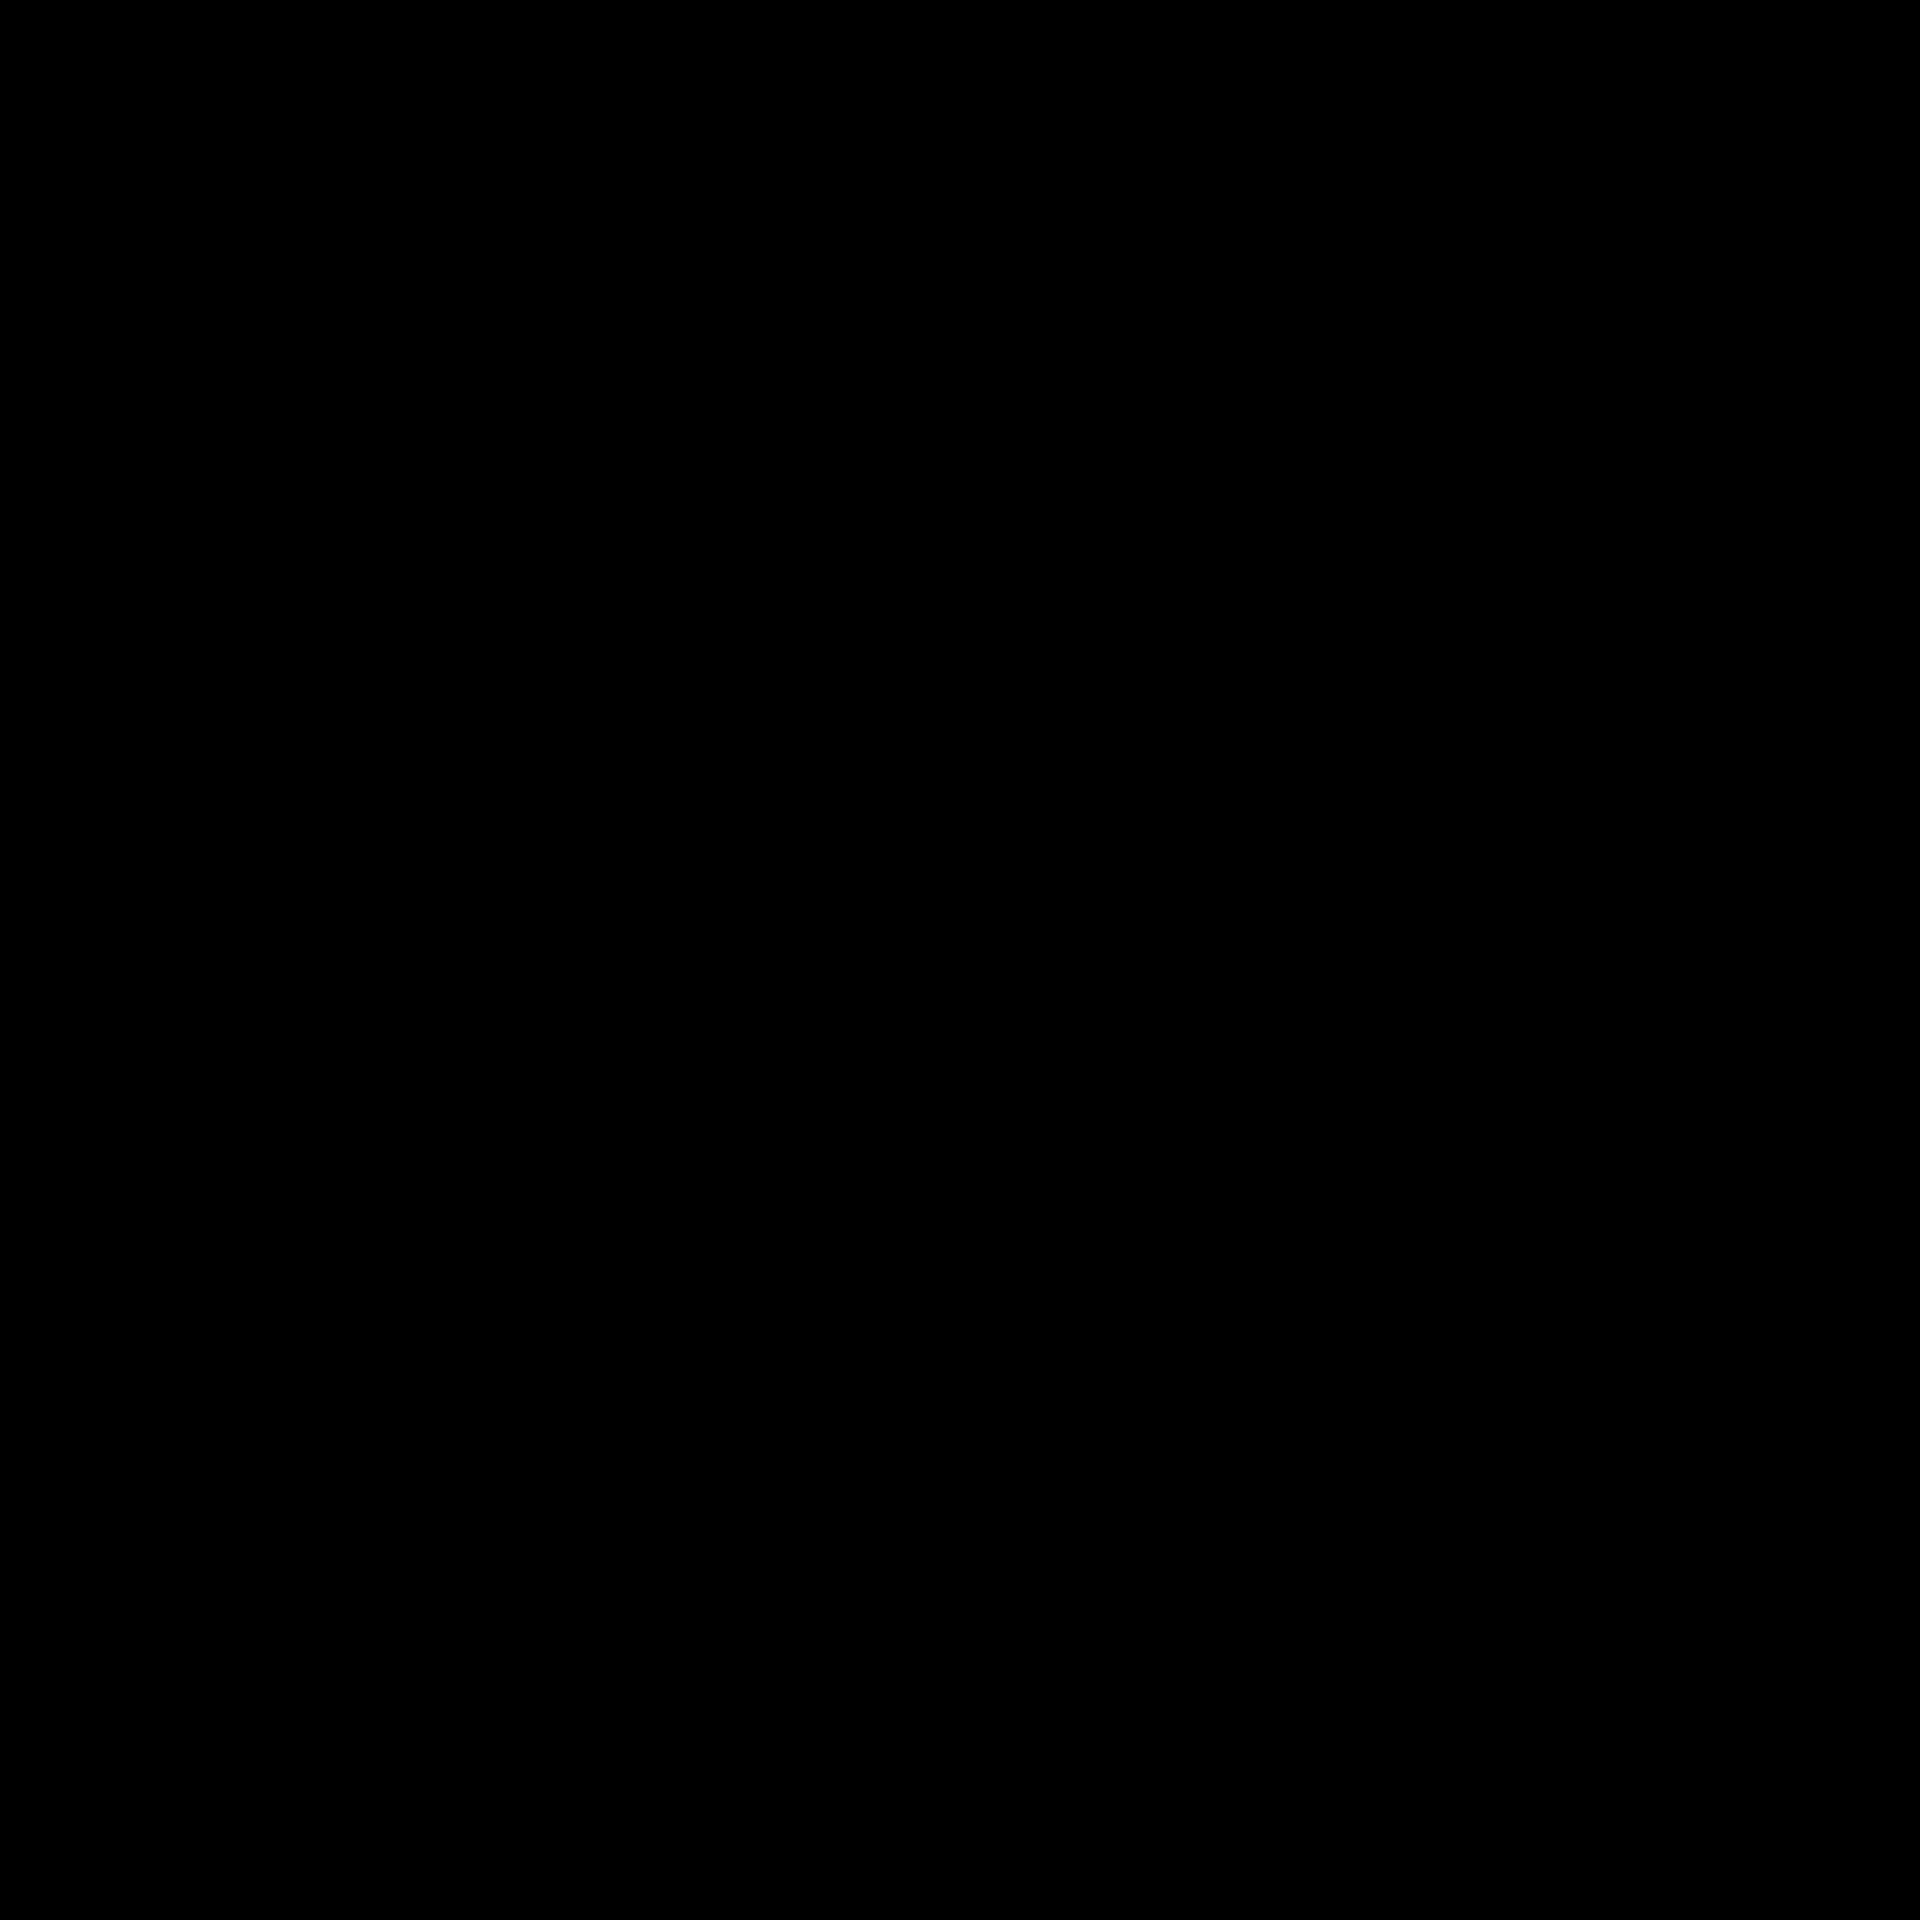 Company profile Writing Services